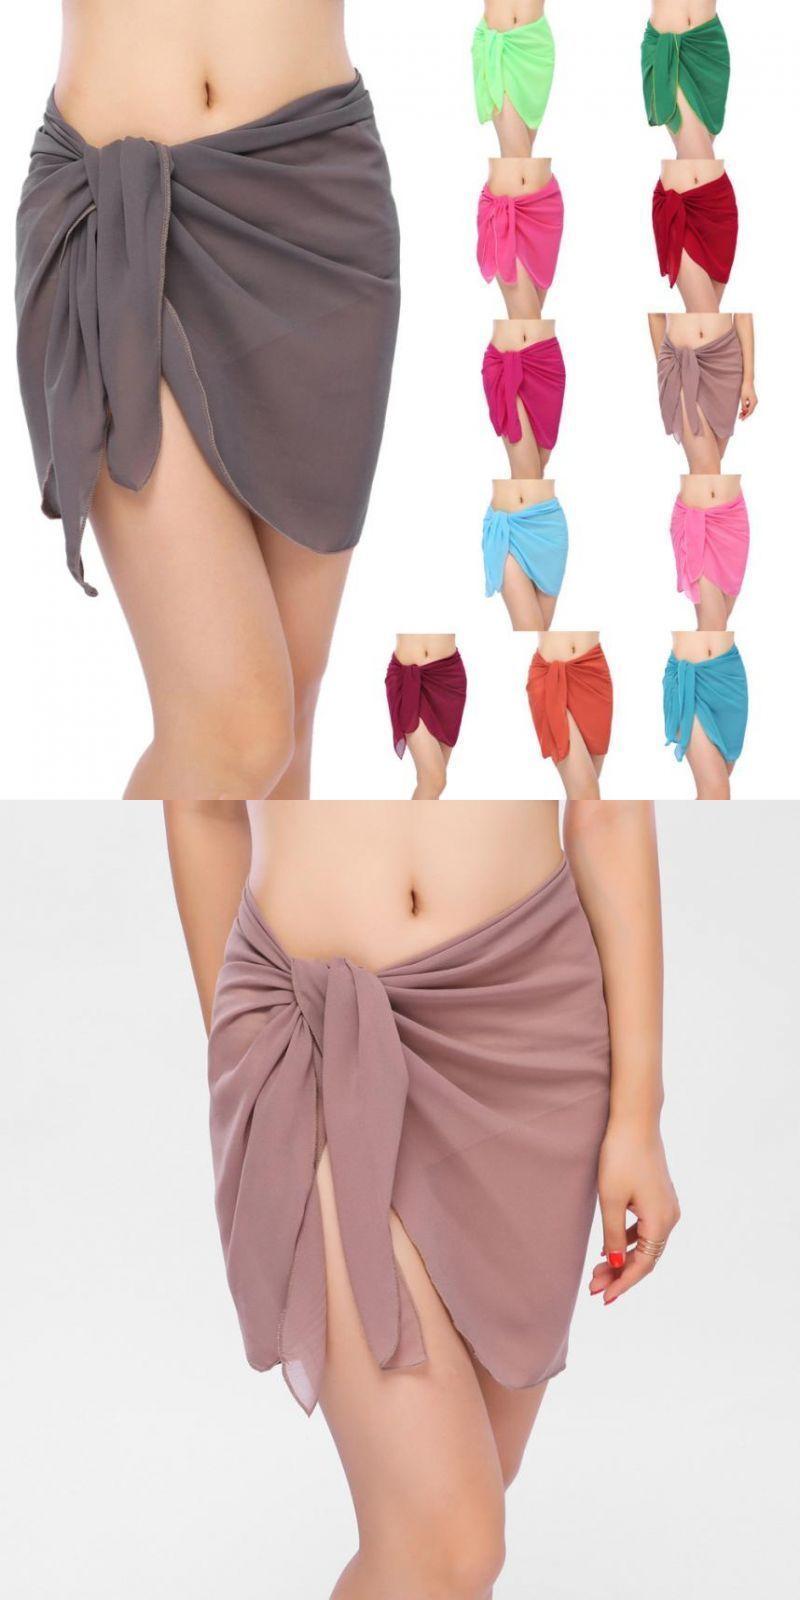 f334a7885f Summer beach wear skirts women solid cover up chiffon bikinis swimwear wrap  swimsuit bathing suit cover-ups  solid  sunbathe  beach  towel